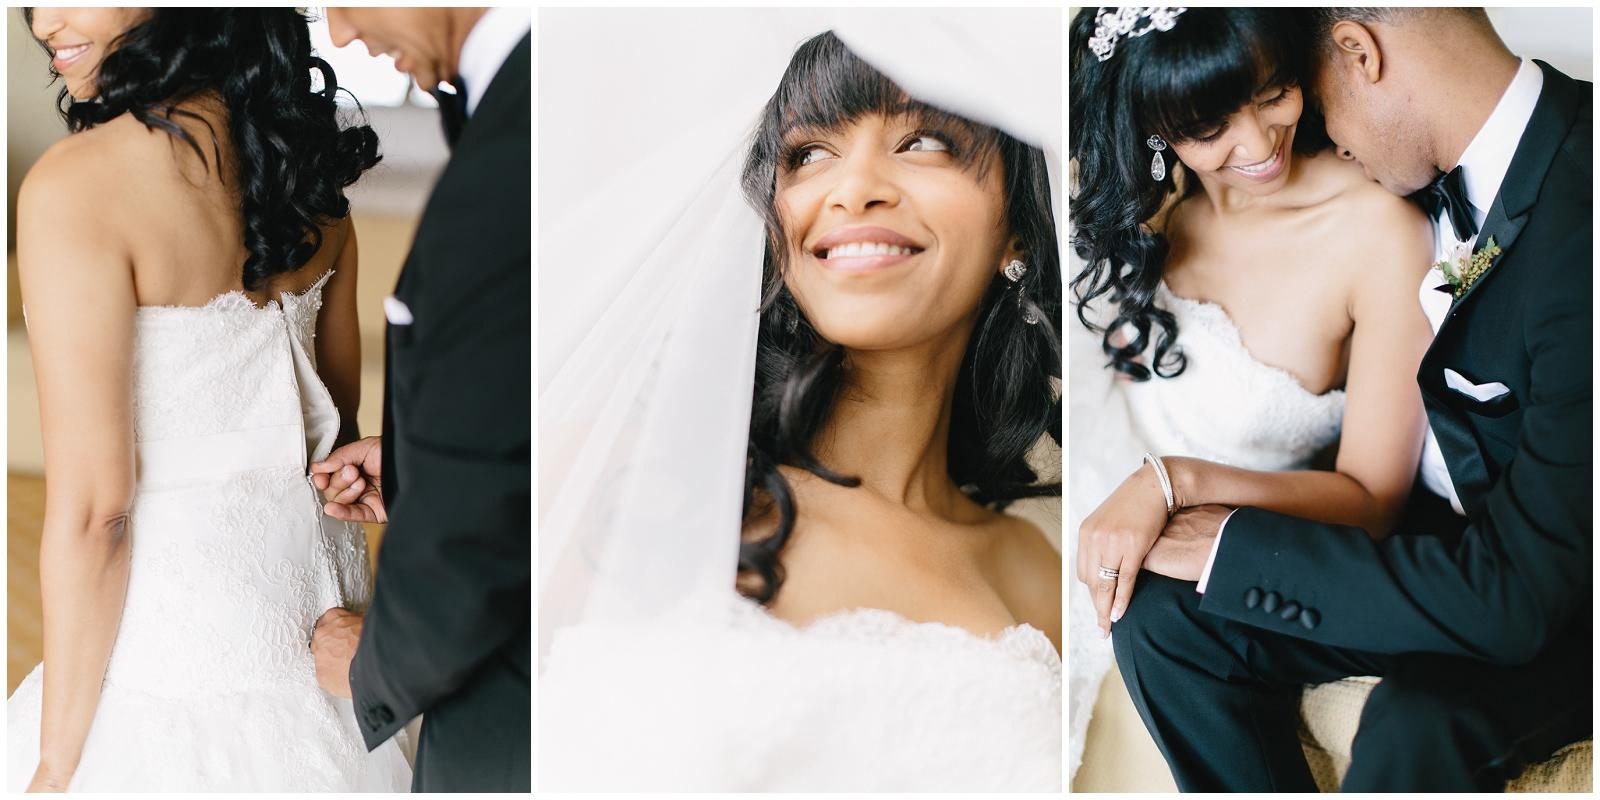 San-Francisco-Bay-Area-Wedding-Photography-Claremont-Hotel-9.jpg